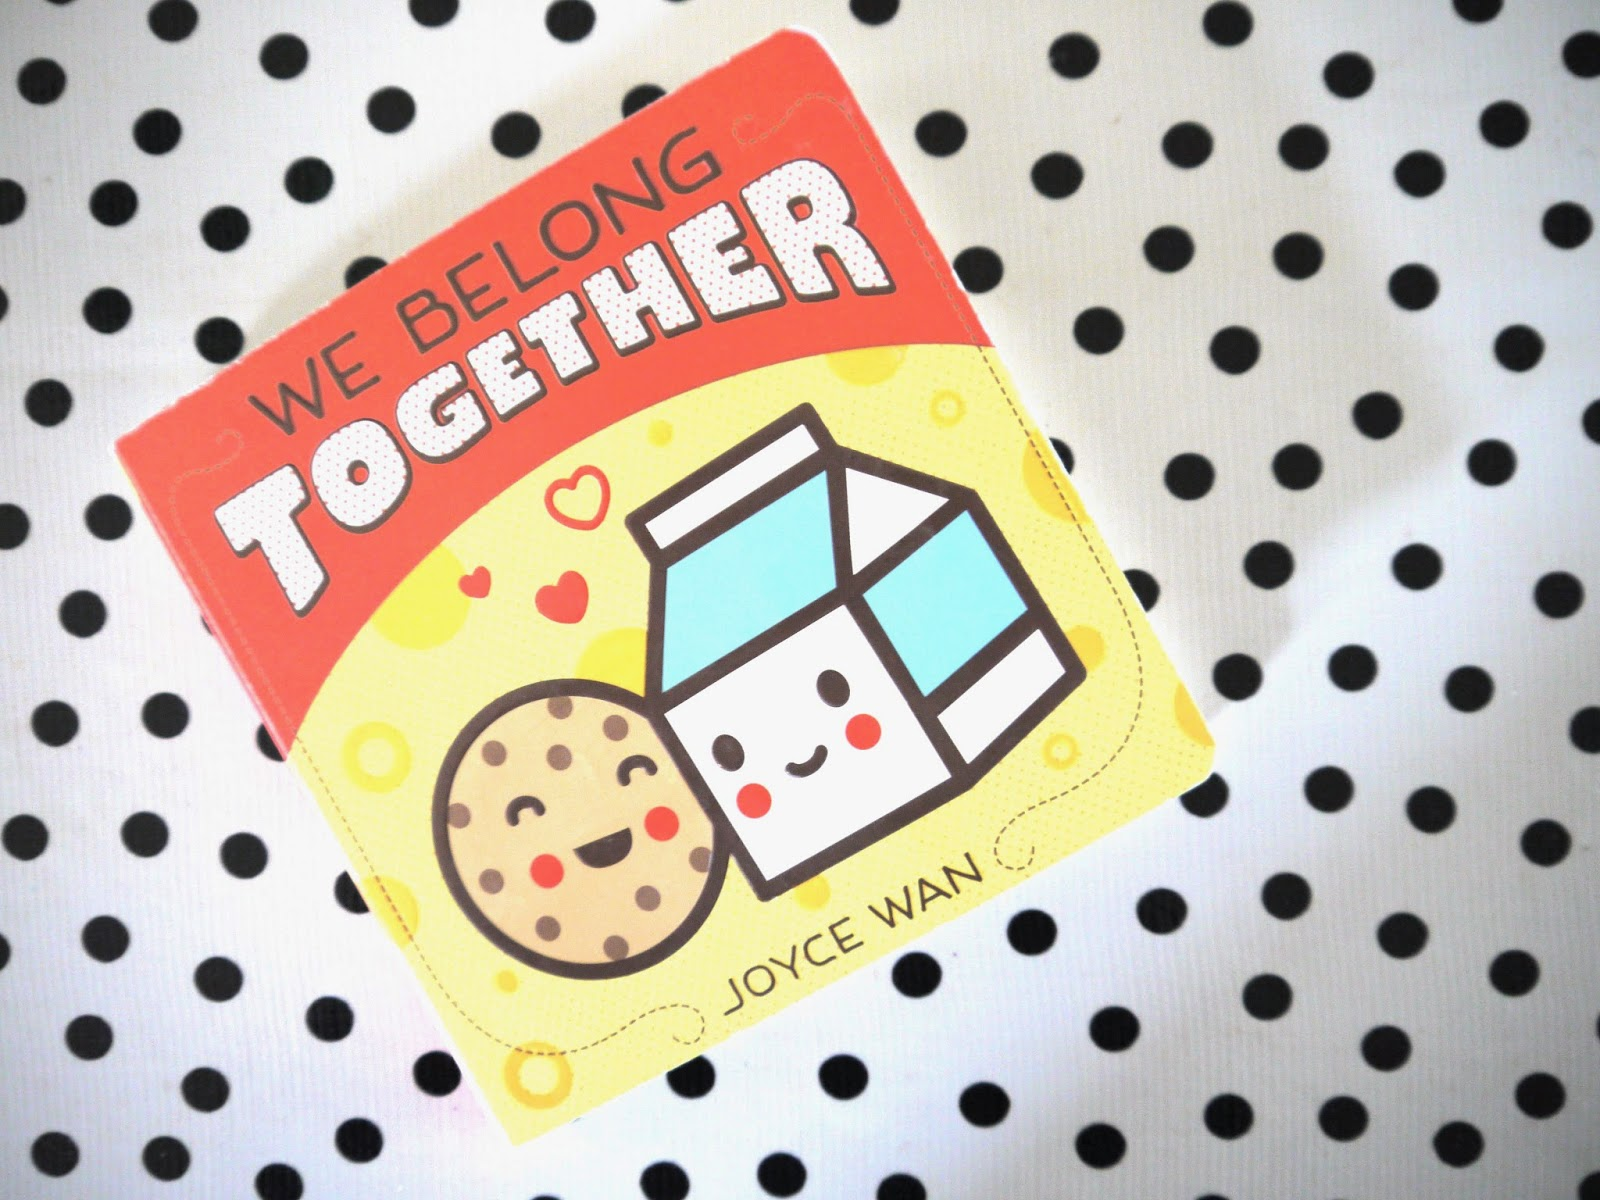 We belong together, Joyce Wan